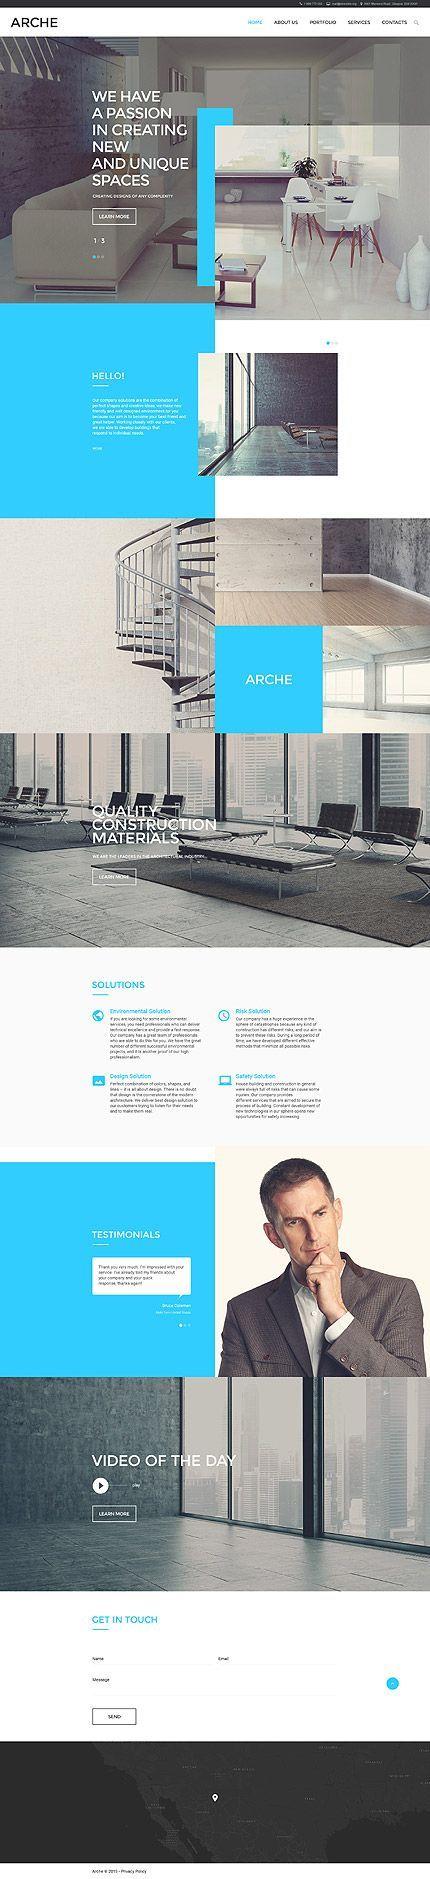 Interior Design #website ~ Love the use of alternate white & blue box spaces to create division ~ repin